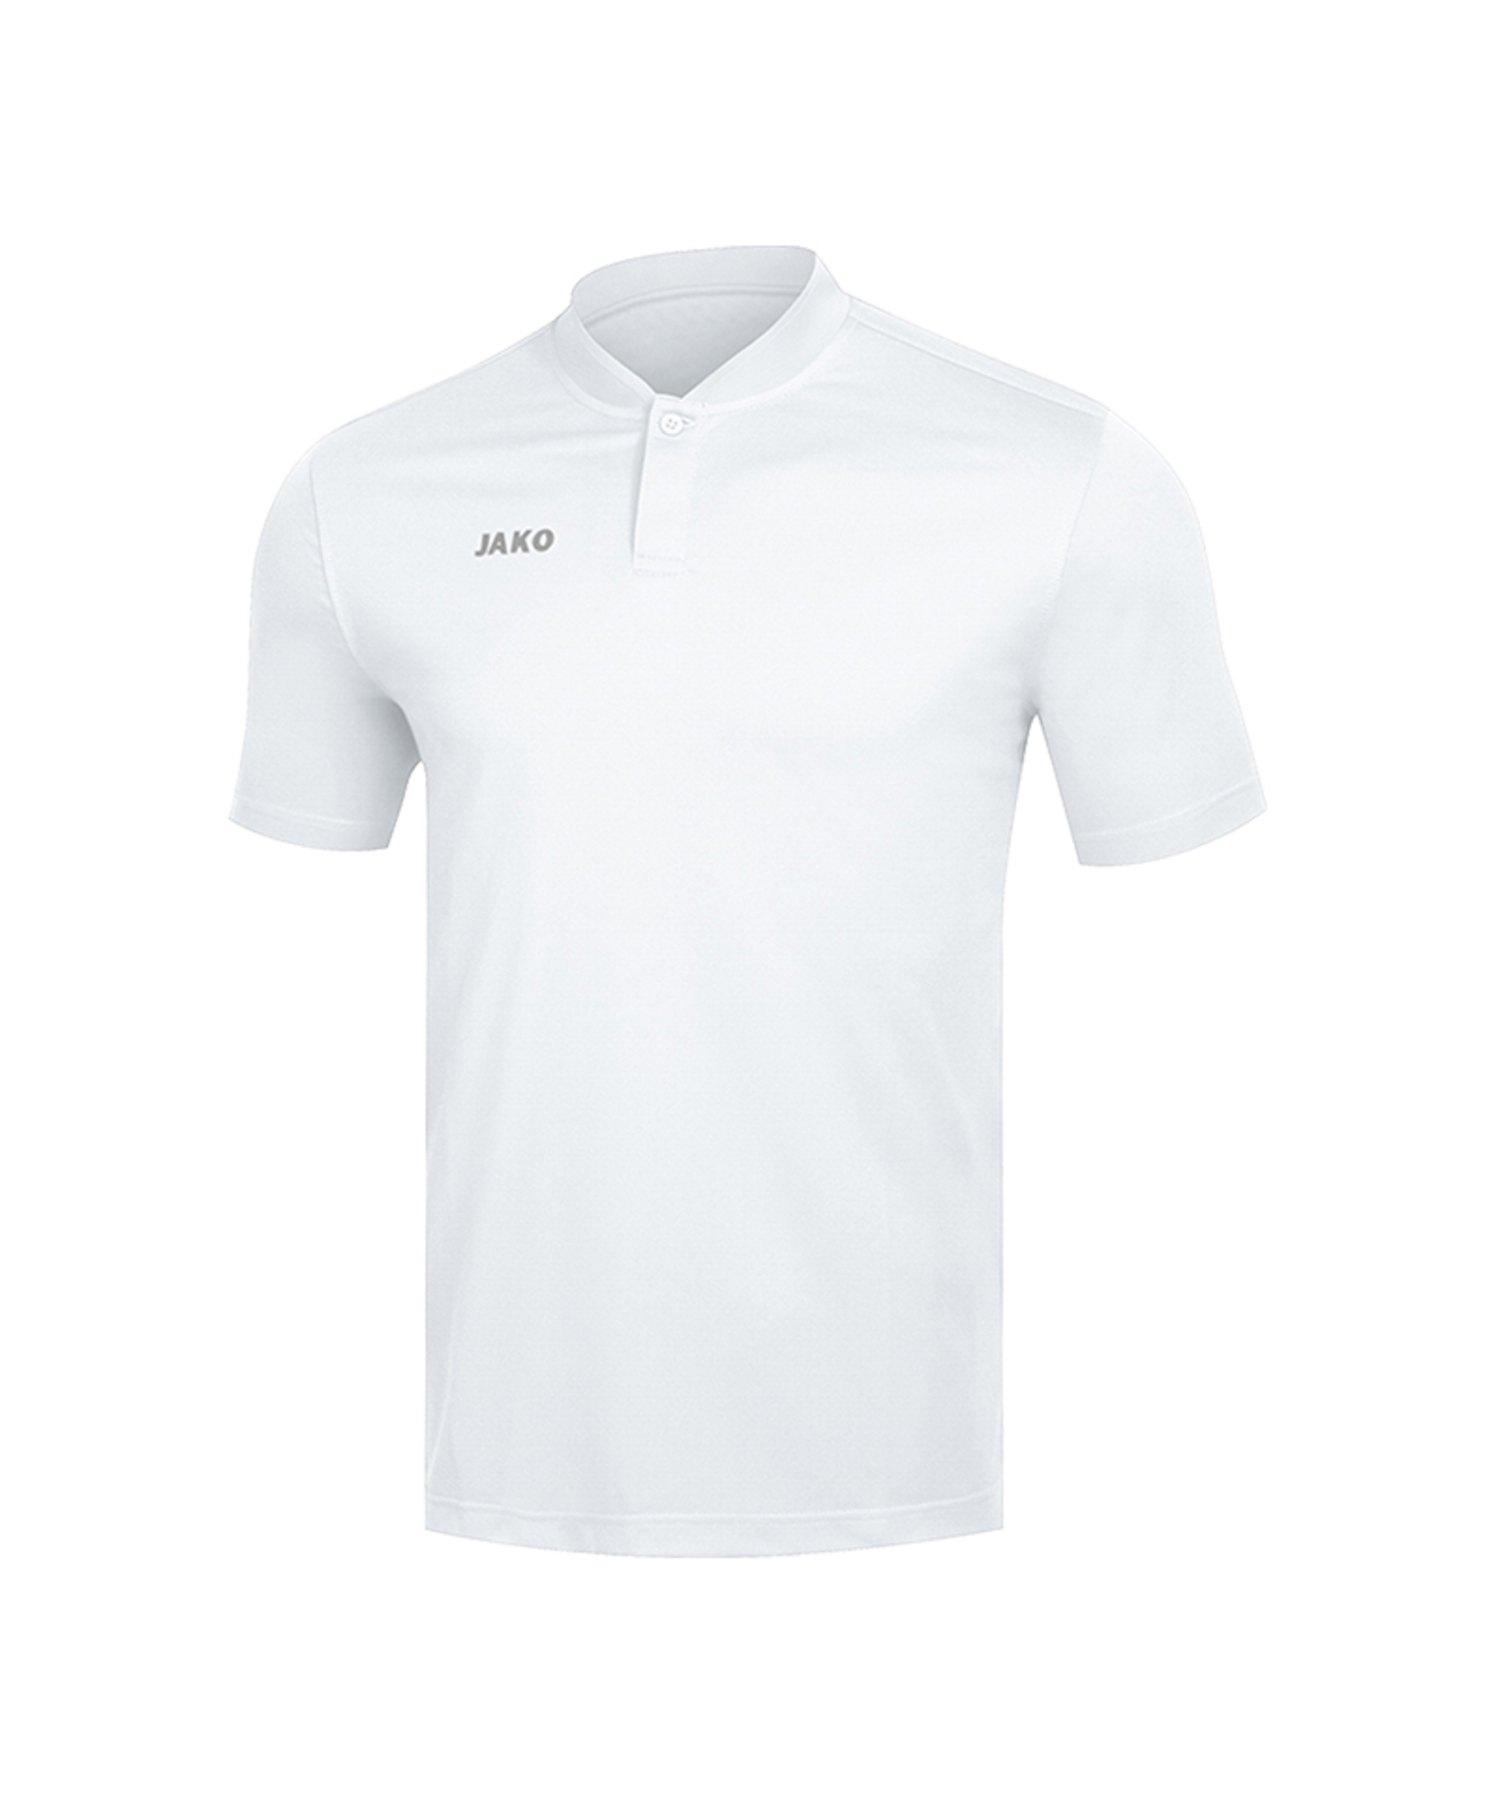 Jako Prestige Poloshirt Weiss F00 - Weiss